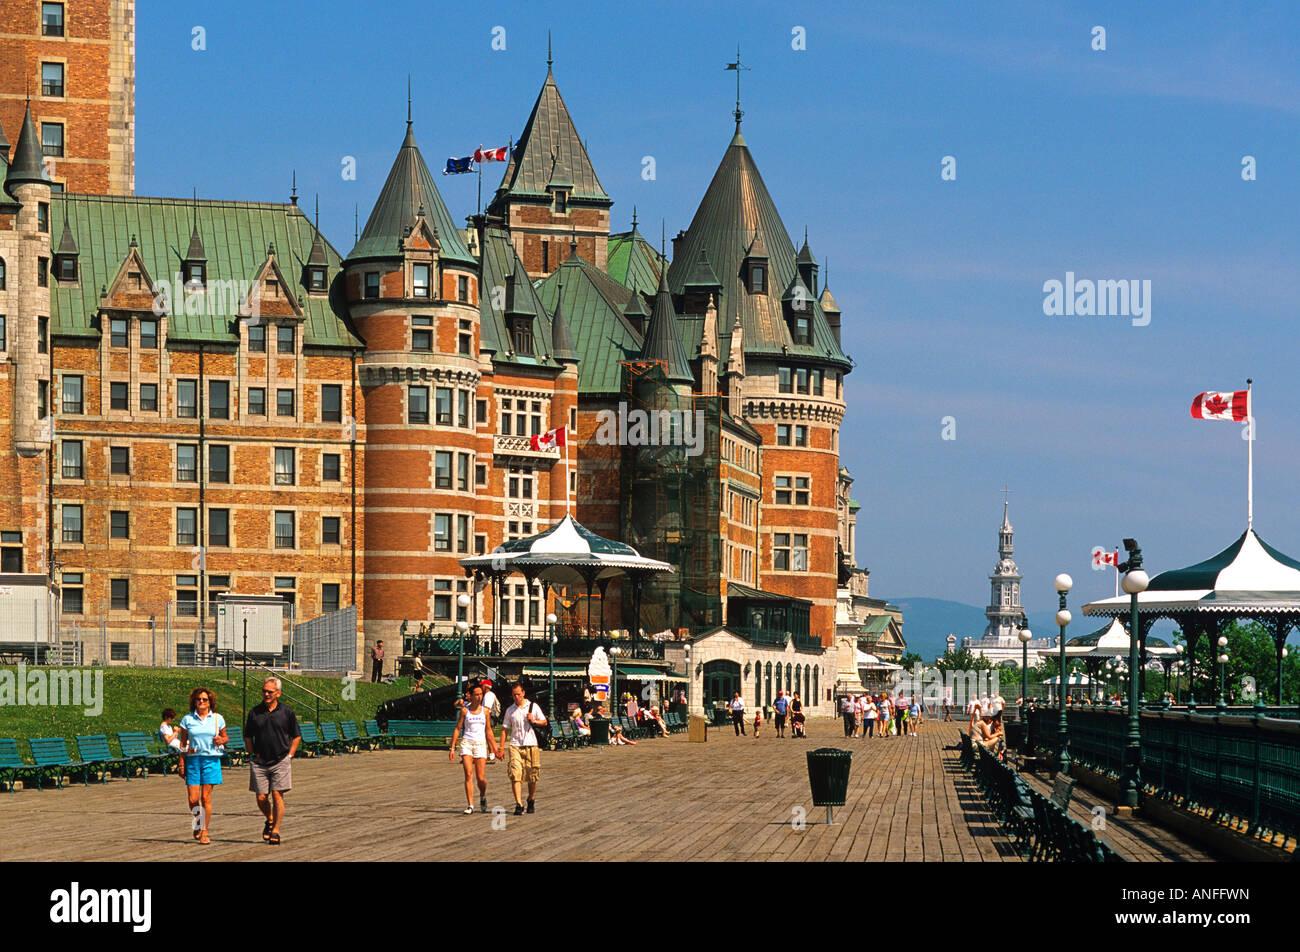 Dufferin Terrace, Le Chateau Frontenac, Quebec City, Quebec, Canada - Stock Image